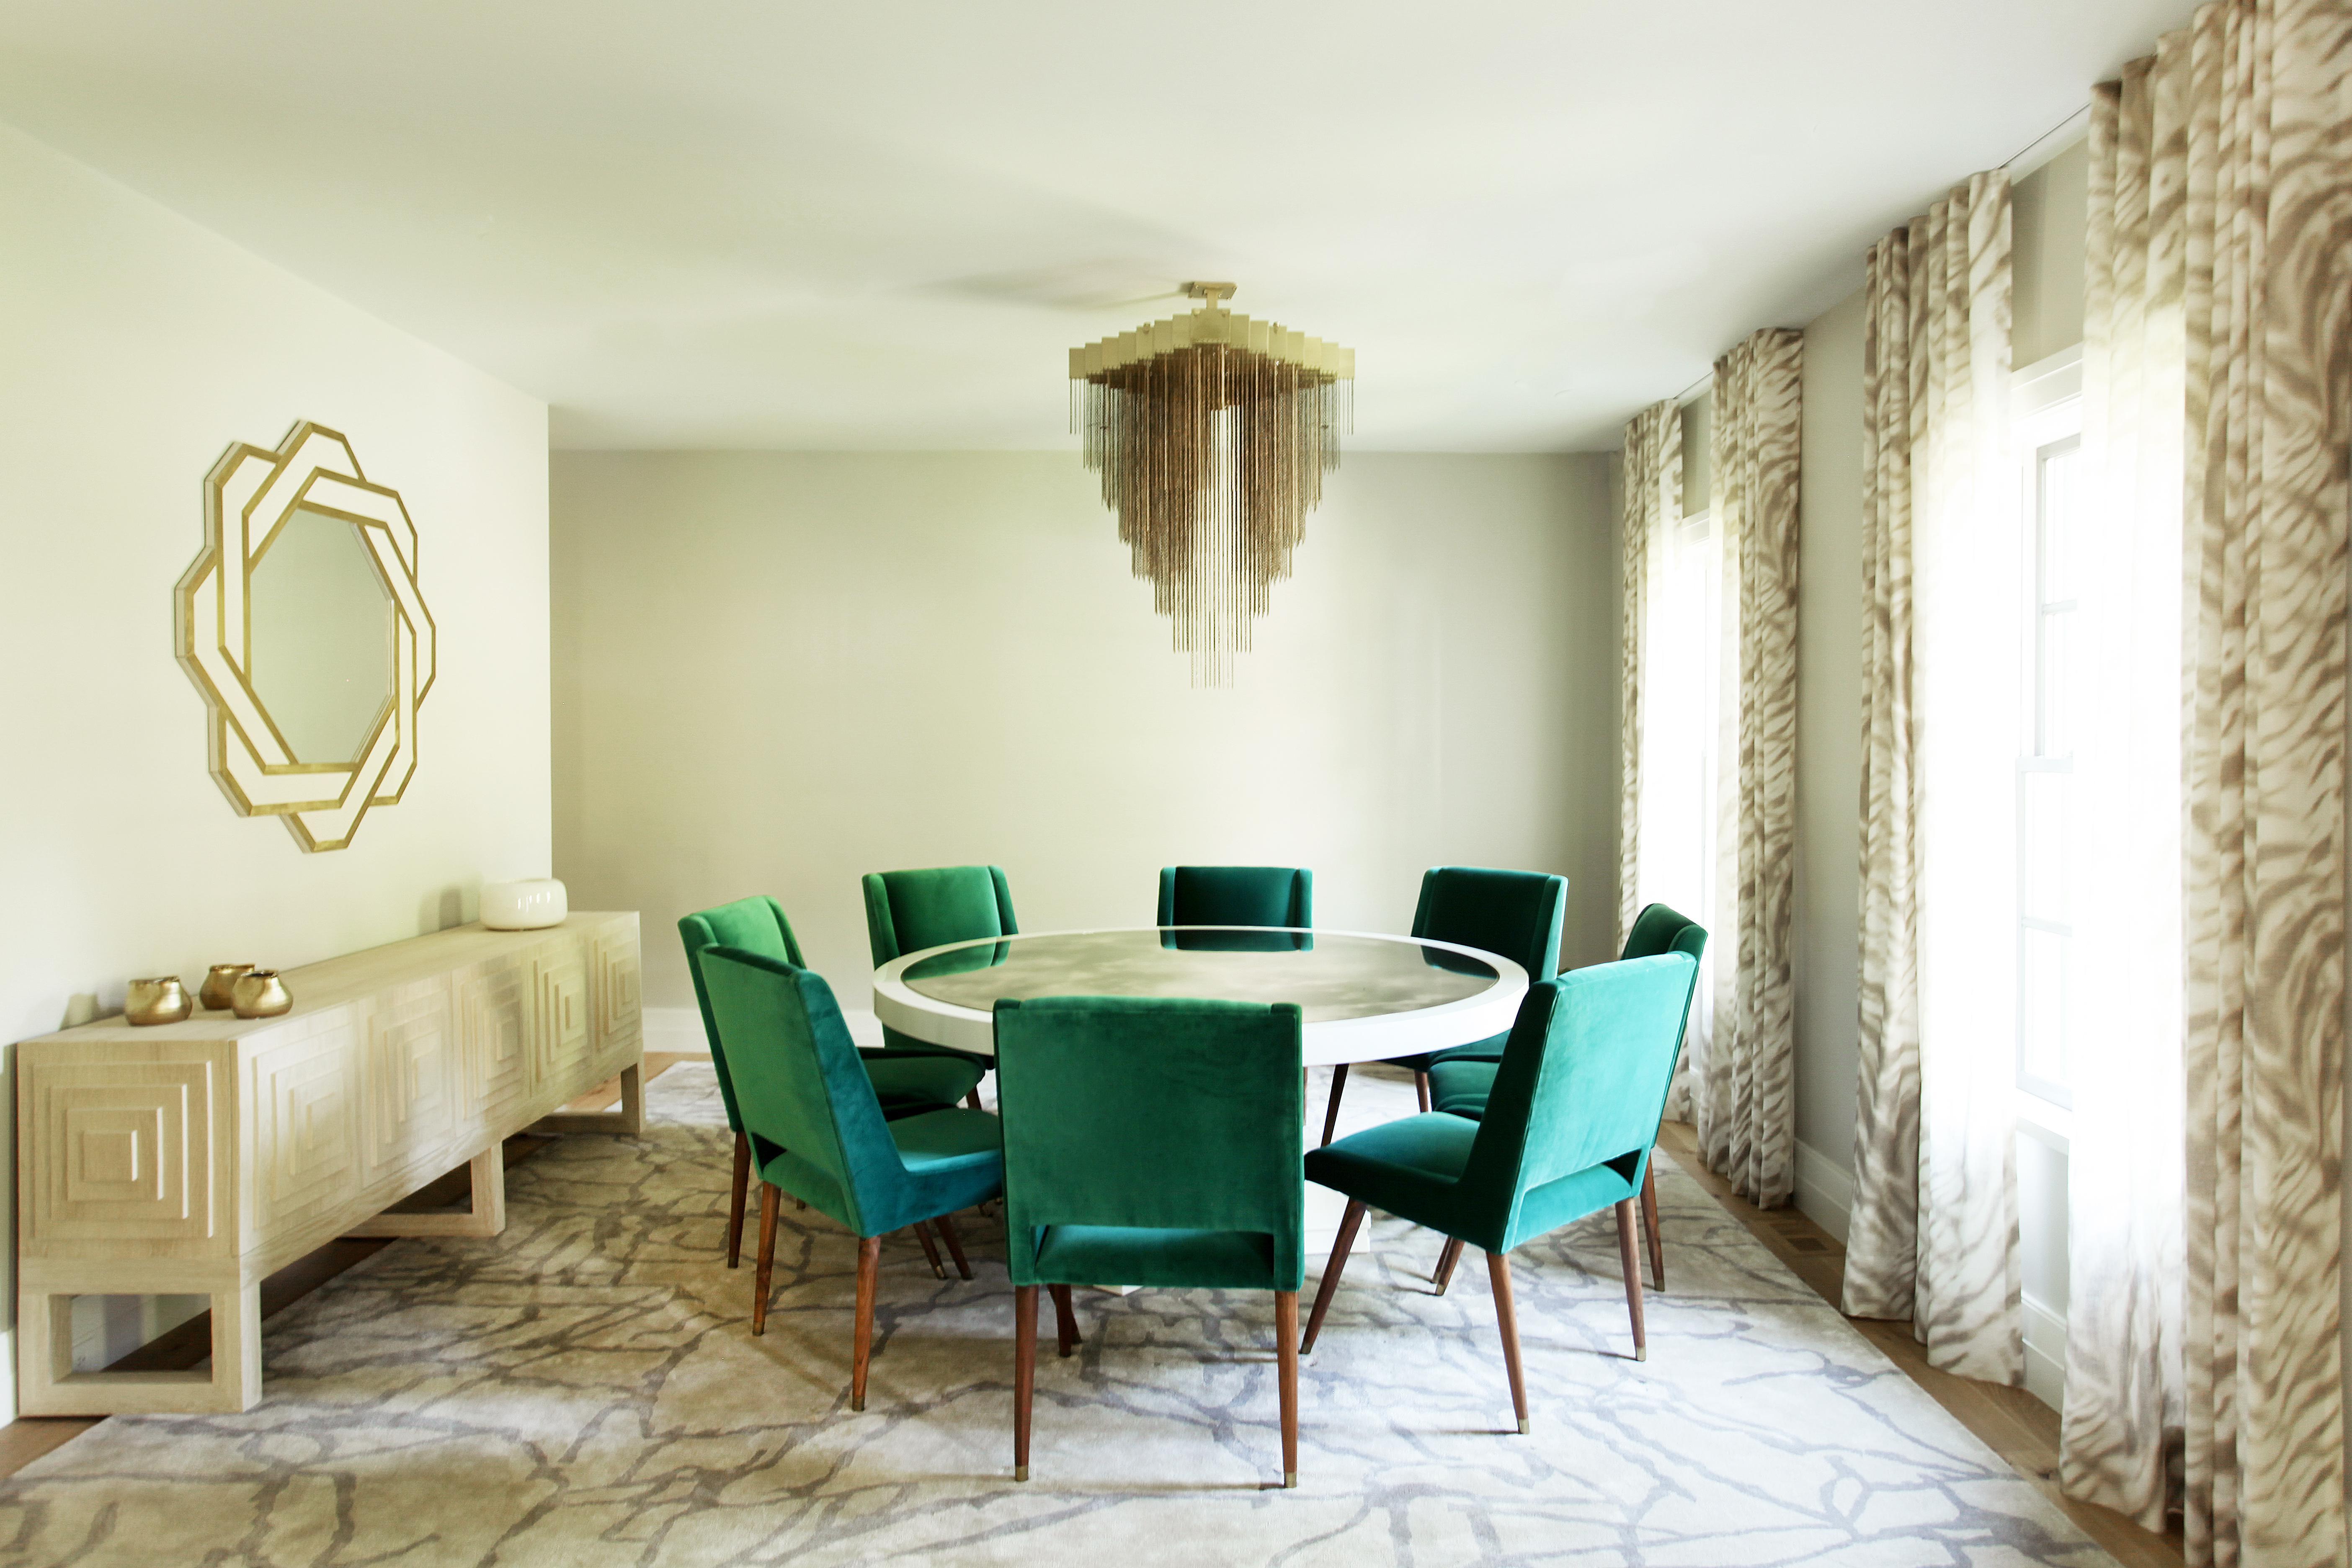 Attrayant Cara.woodhouse.interiors.llc.portfolio.interiors.dining.1501105455.054873